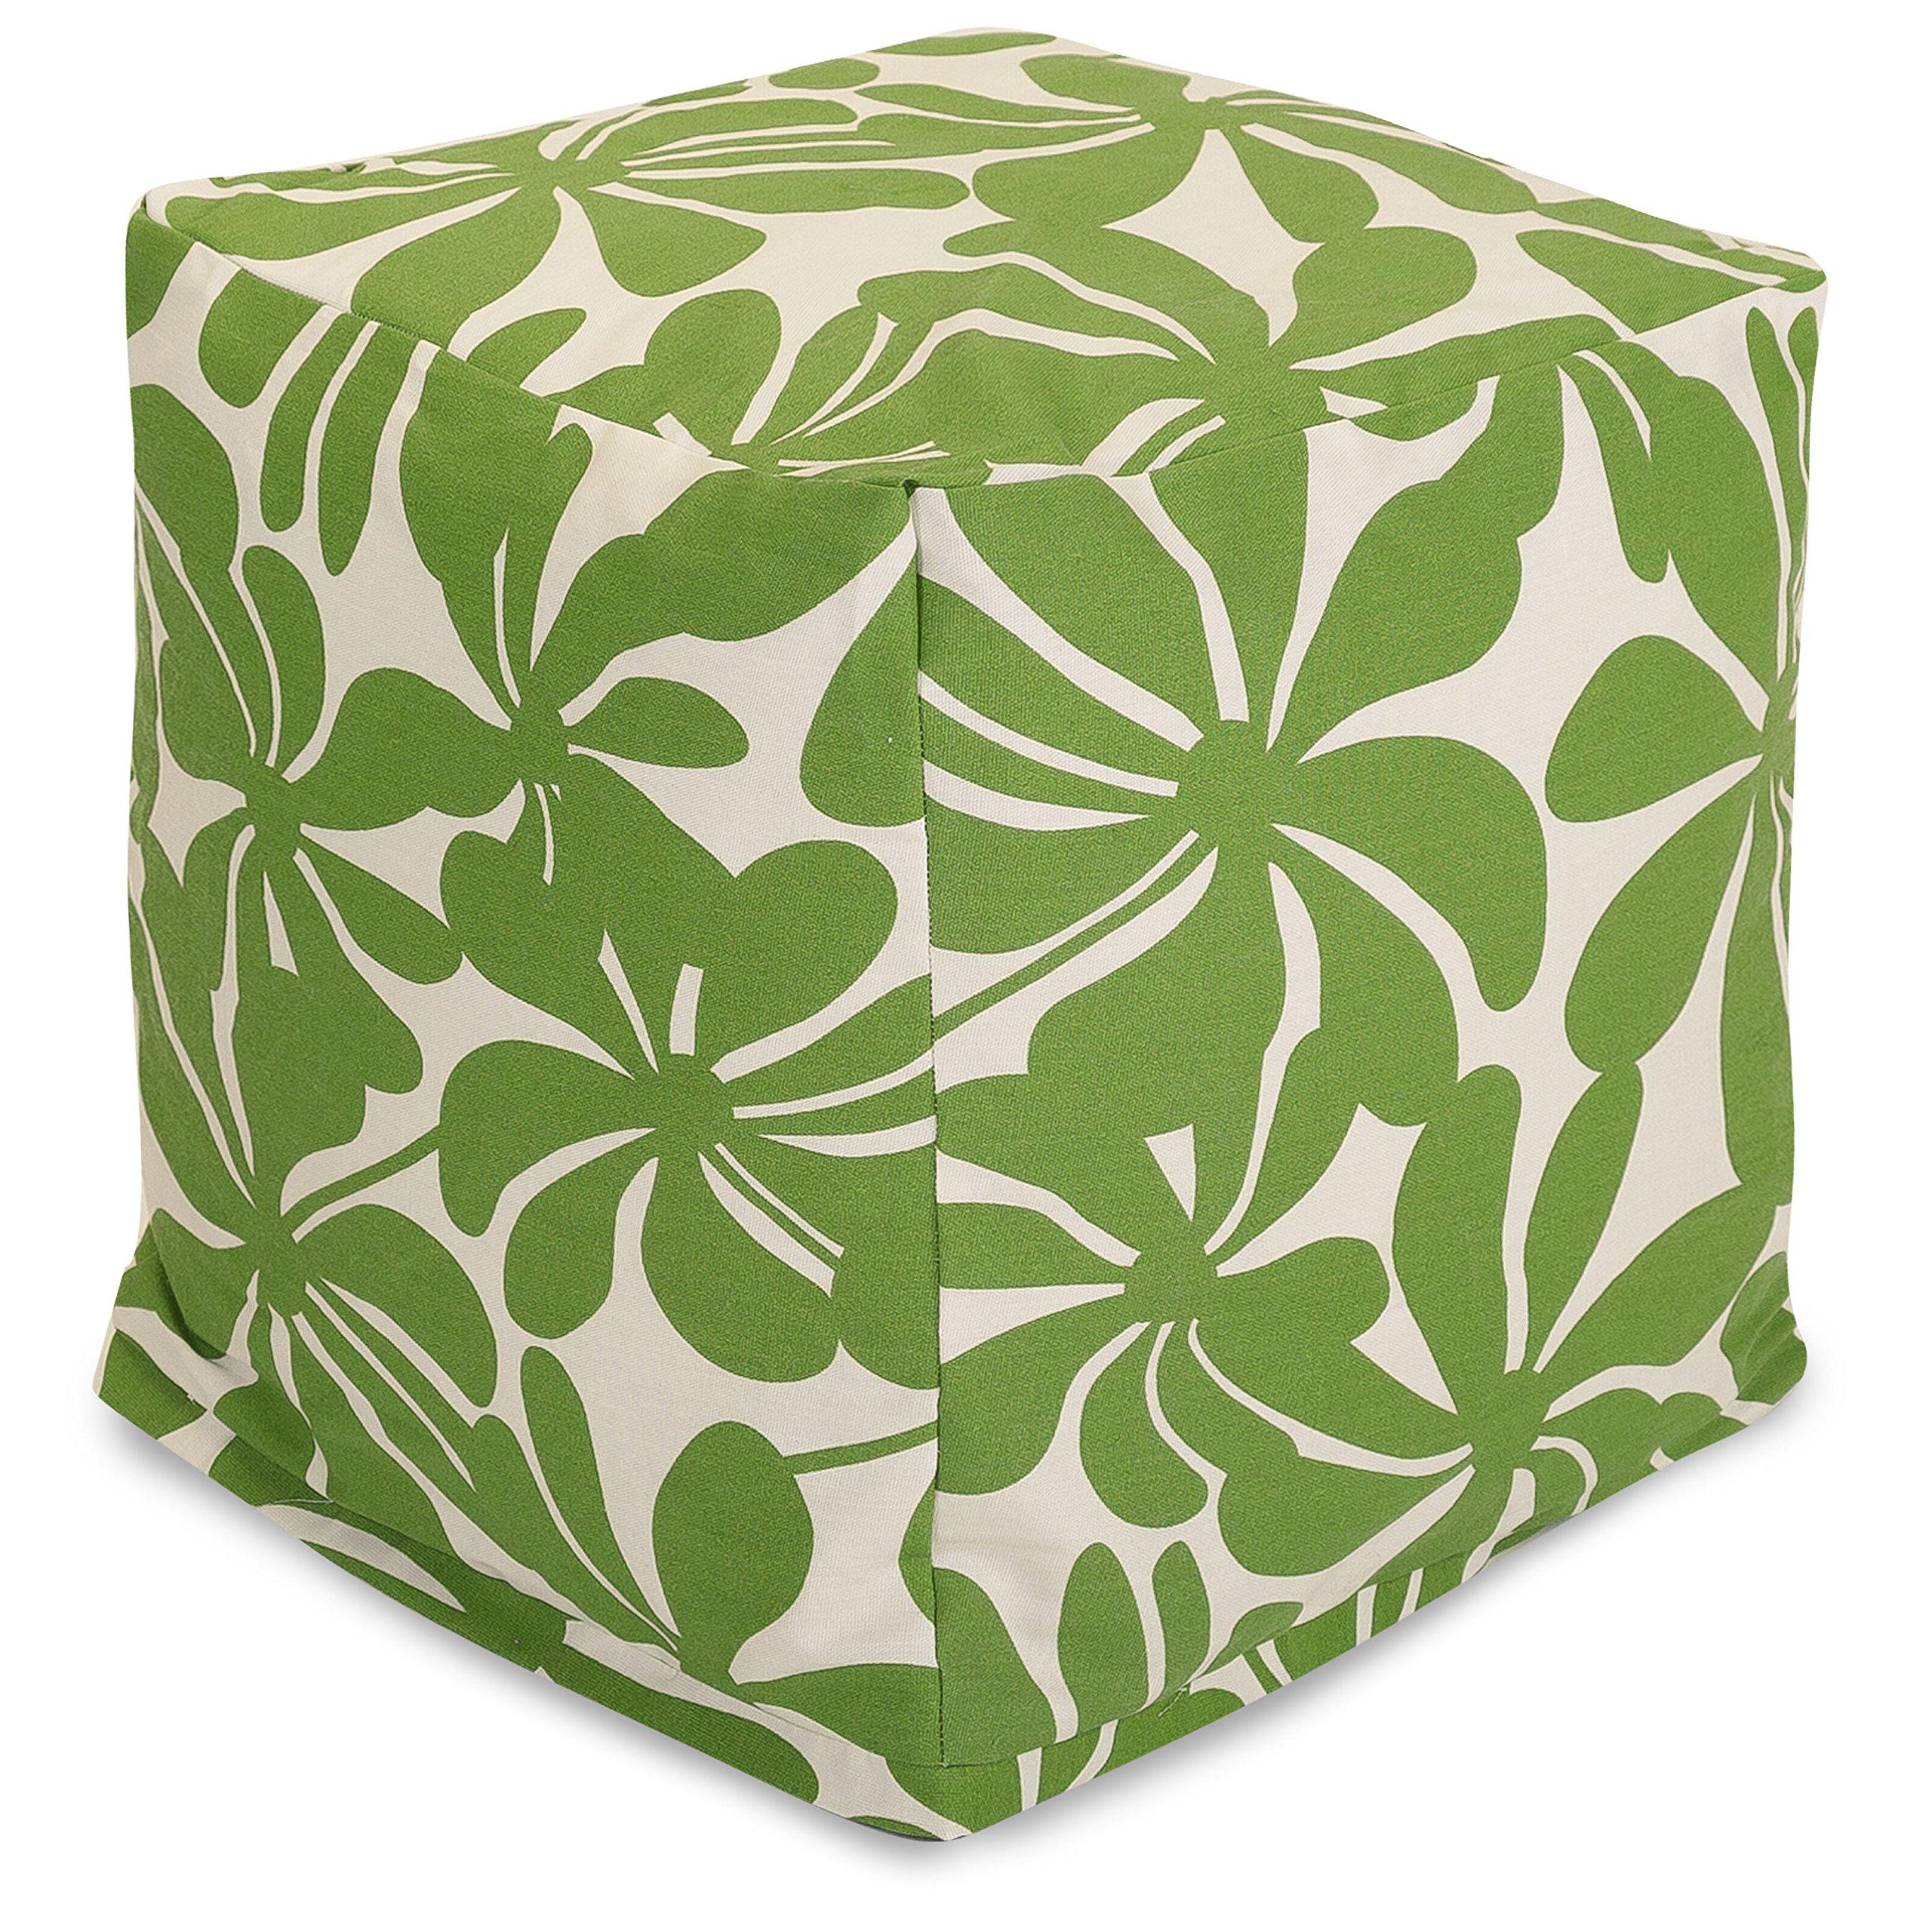 Majestic Home Goods Sage Plantation Indoor/Outdoor Bean Bag Ottoman Pouf Cube 17'' L x 17'' W x 17'' H